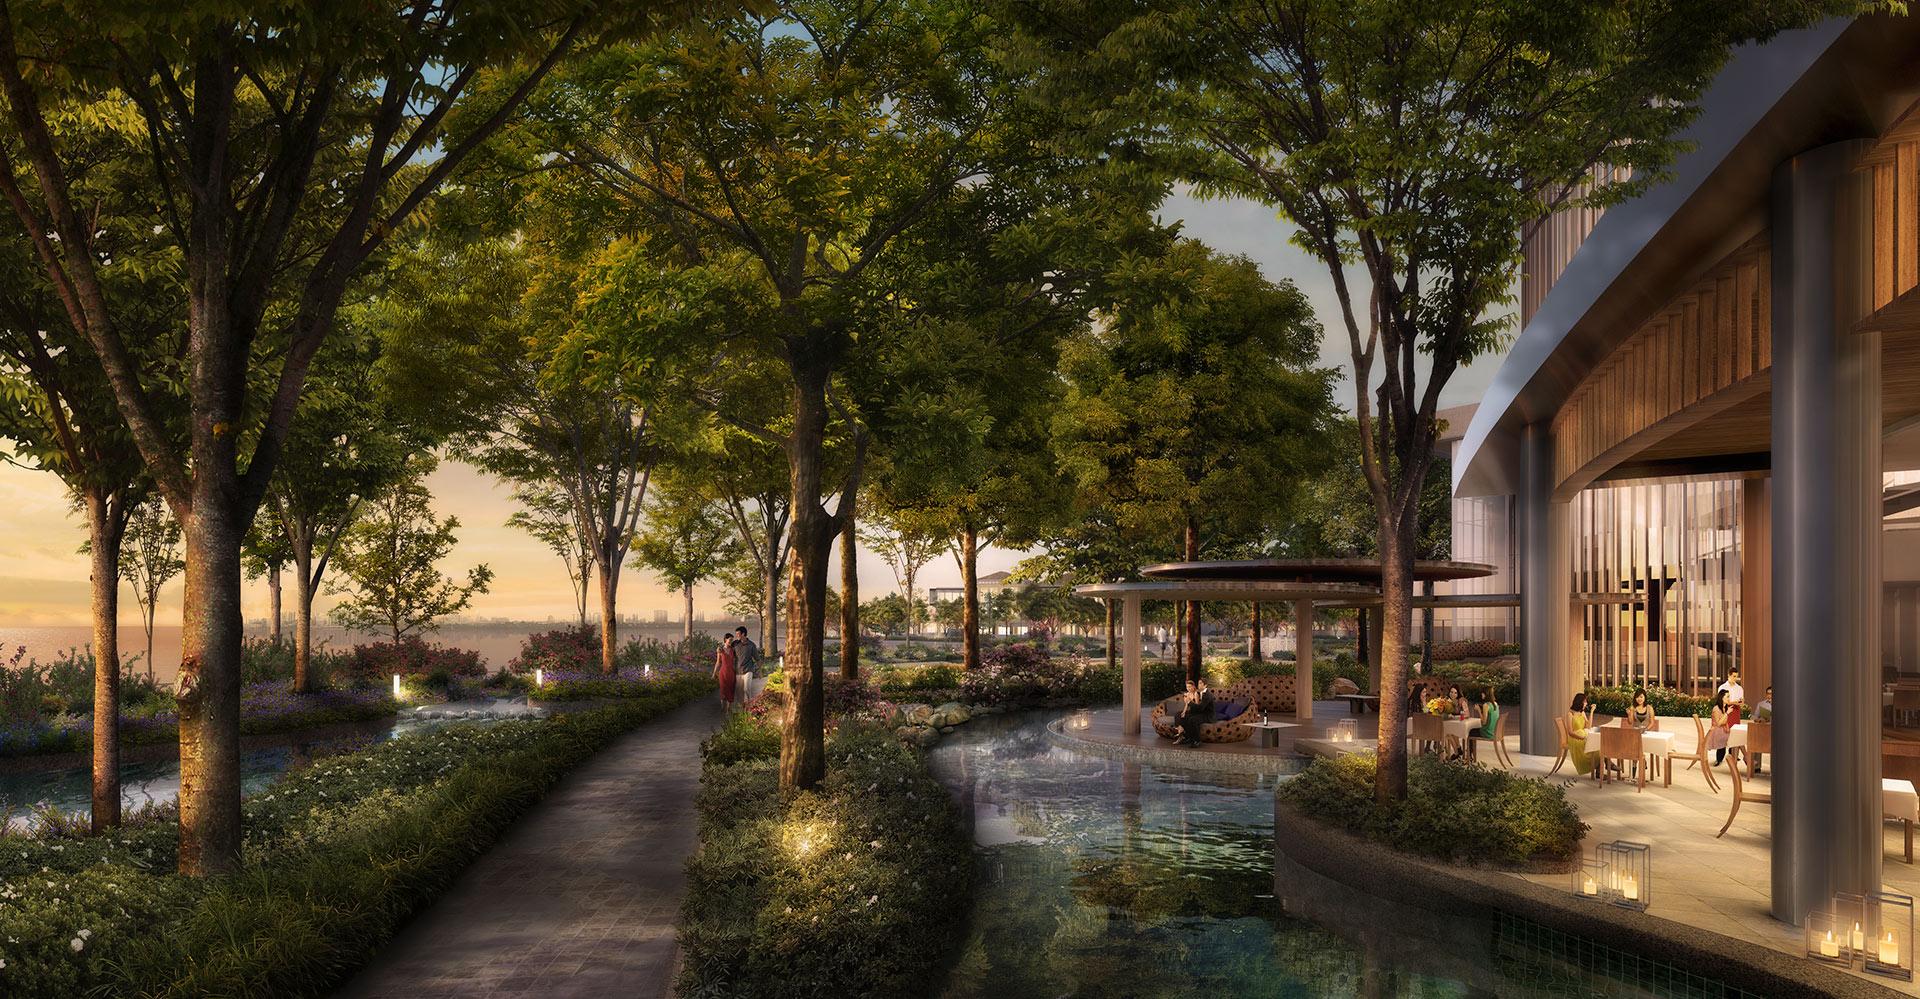 Chengdu Mixed-Use Development and Hyatt Regency Dining